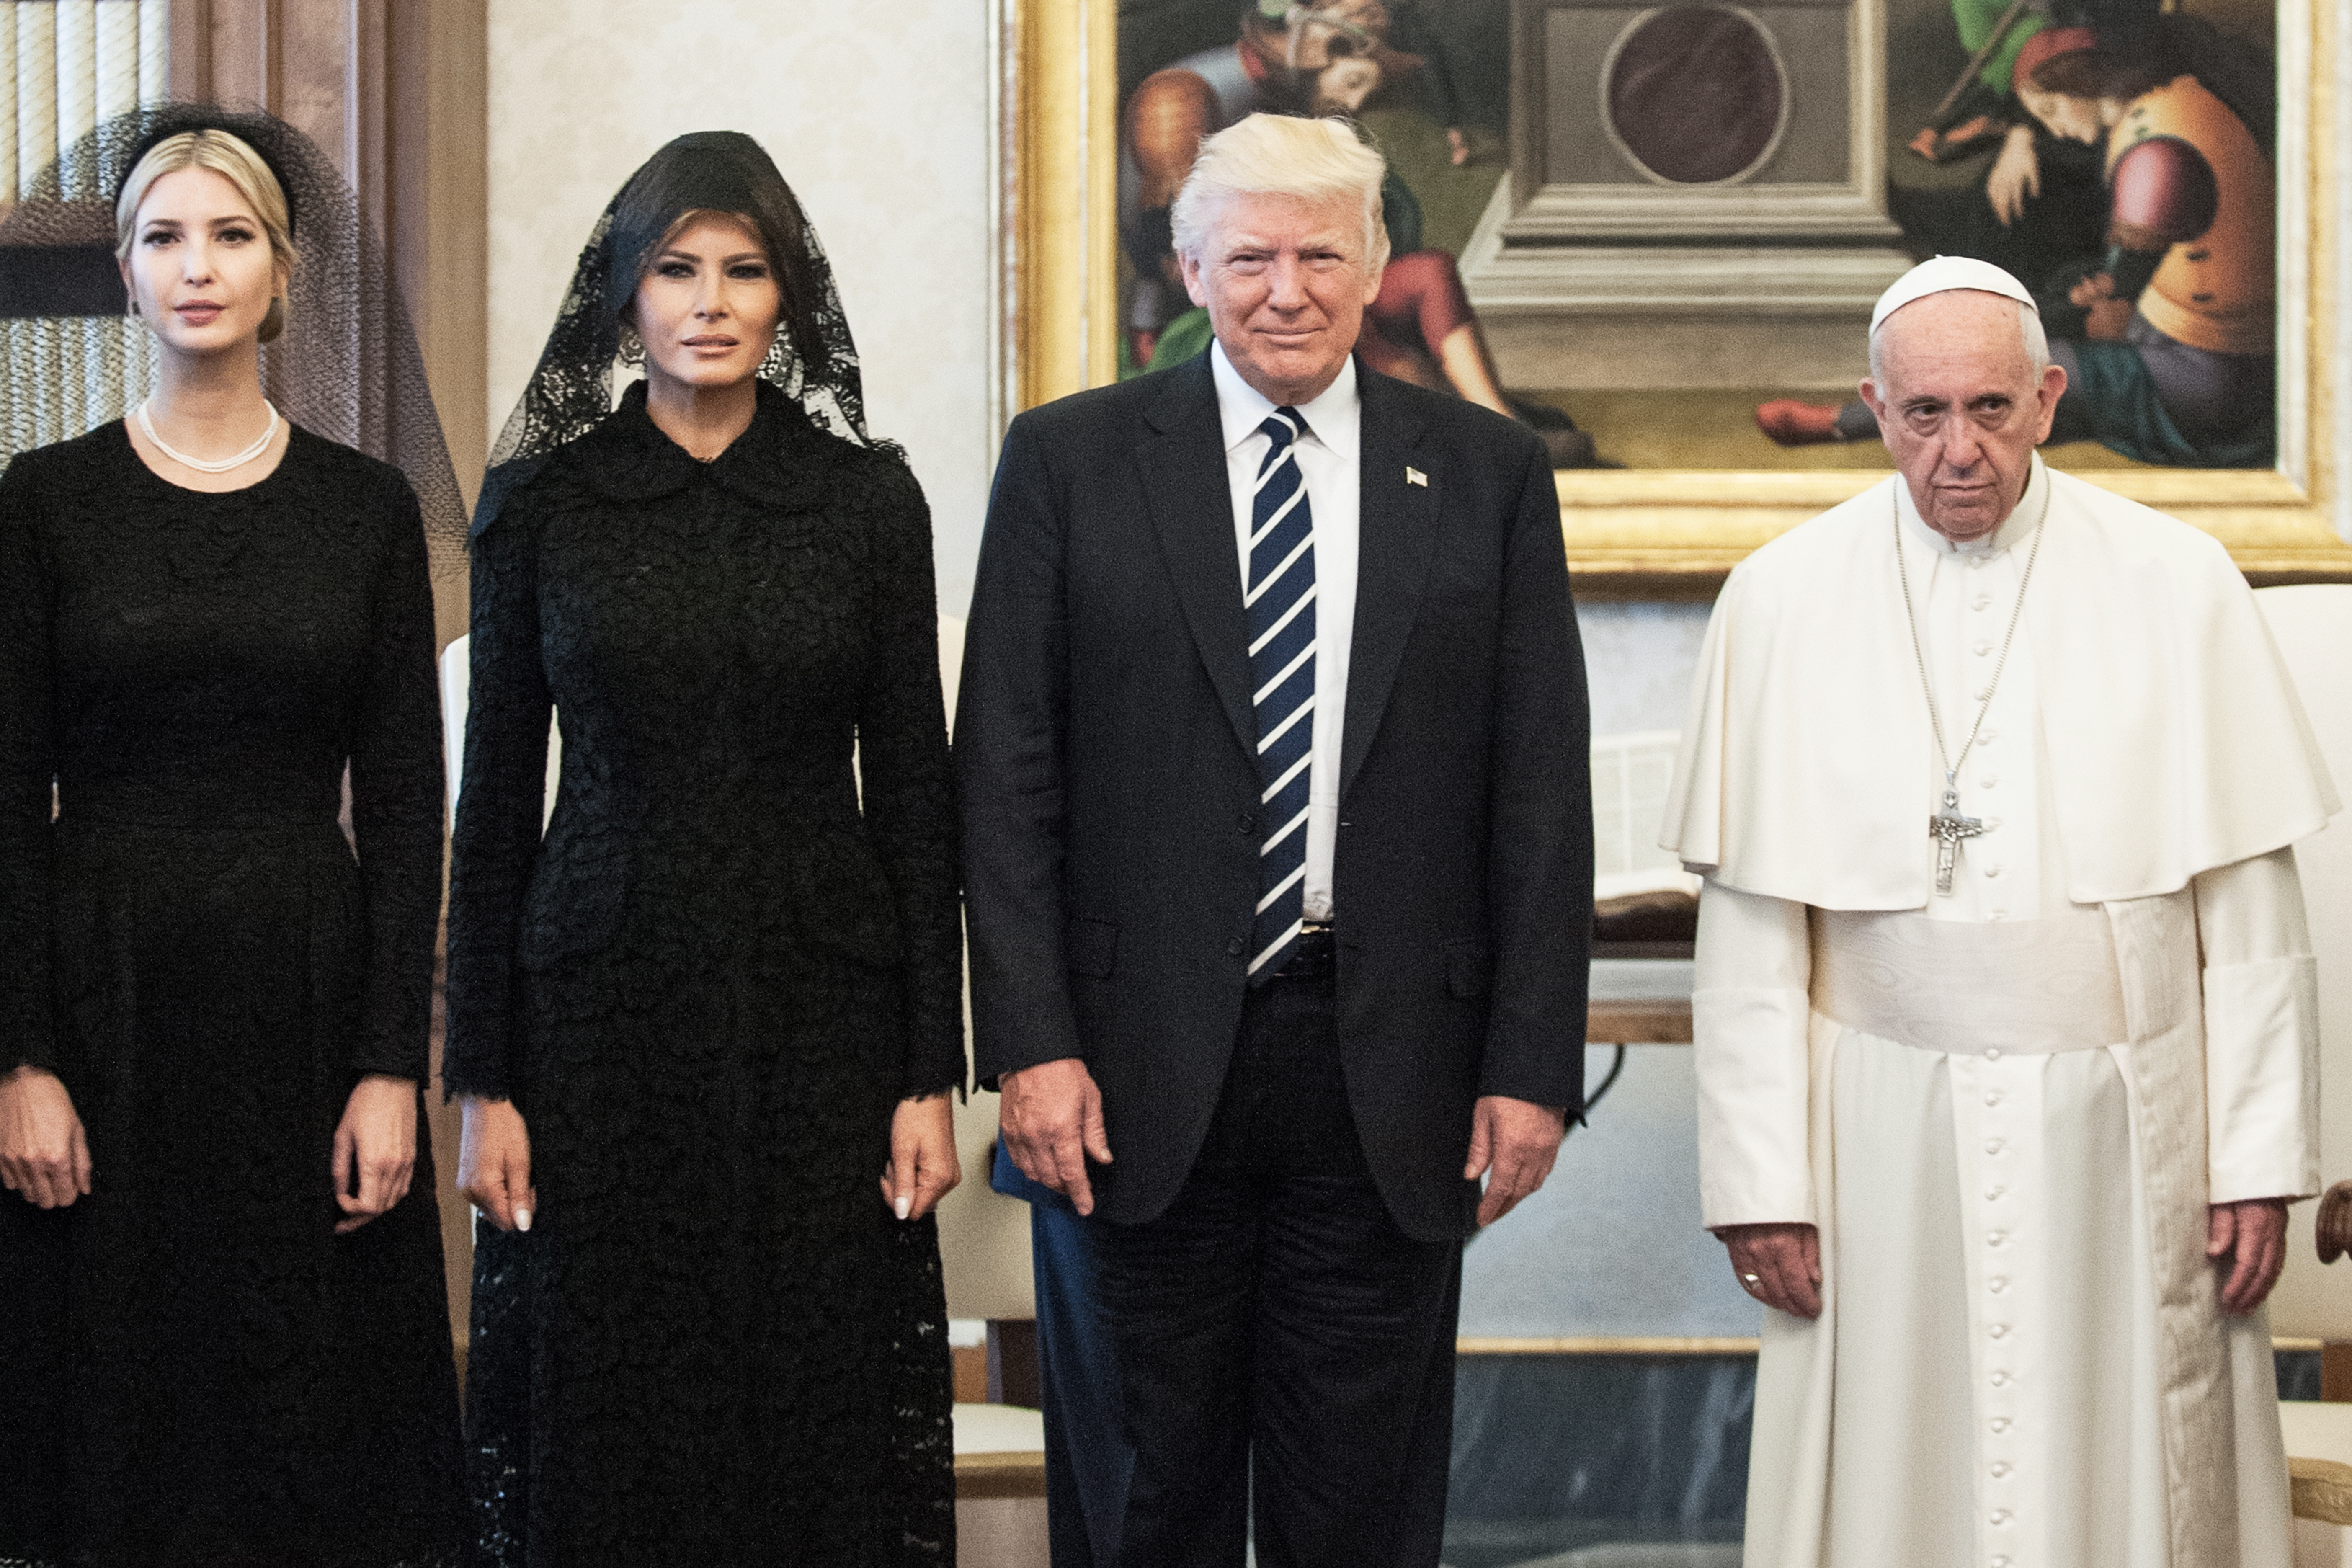 Pope Francis Meets USA President Donald Trump